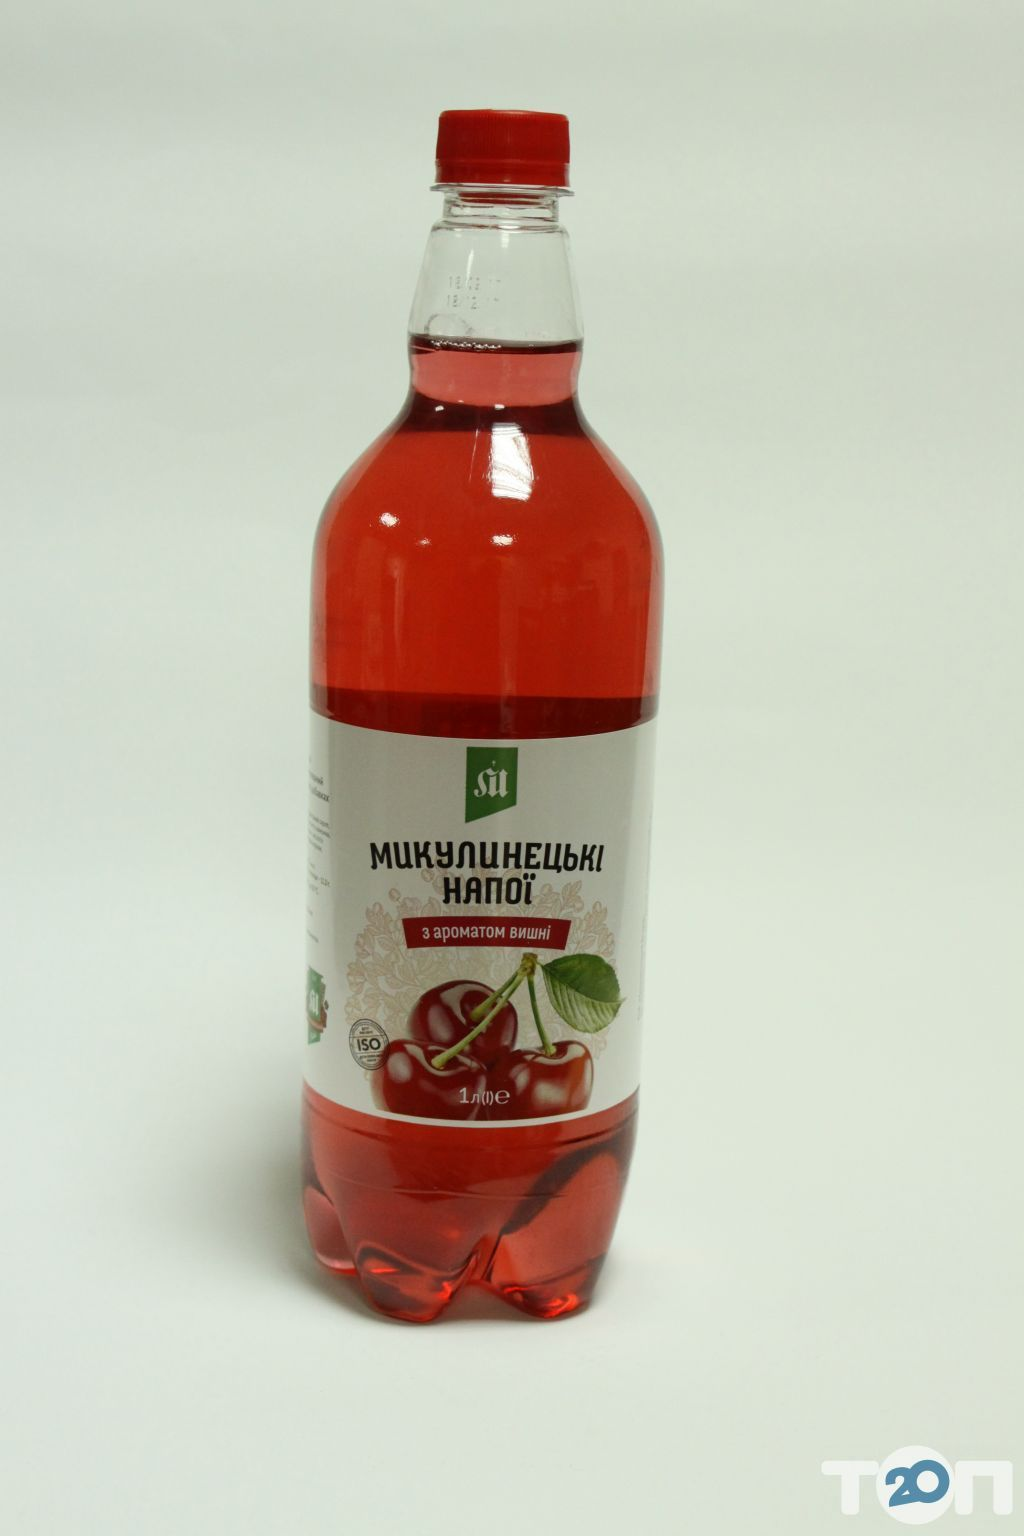 Микулинецький Бровар, виробник безалкогольних напоїв - фото 3